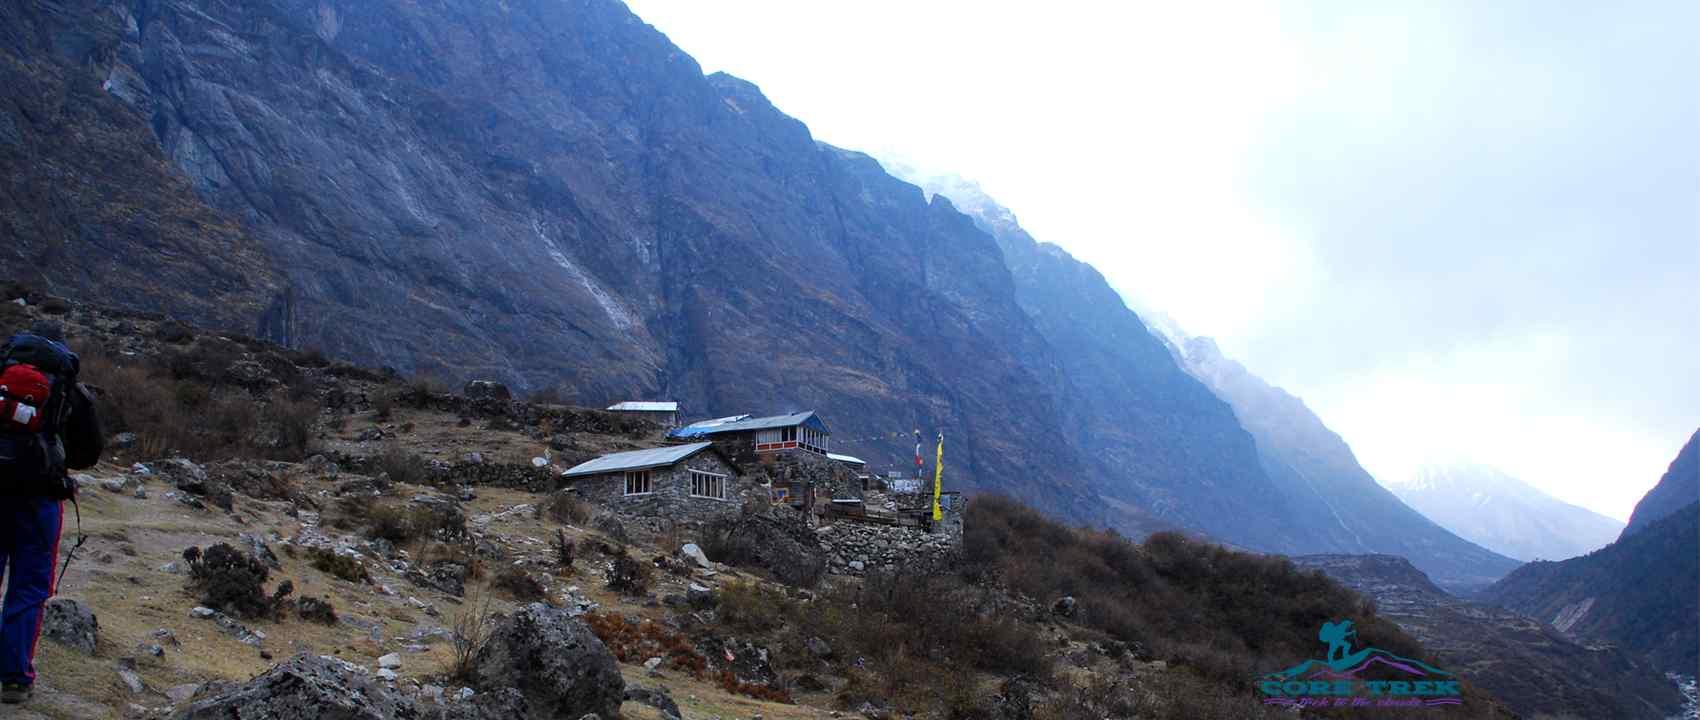 Langtang Valley Trek and Return via Helicopter in Nepal